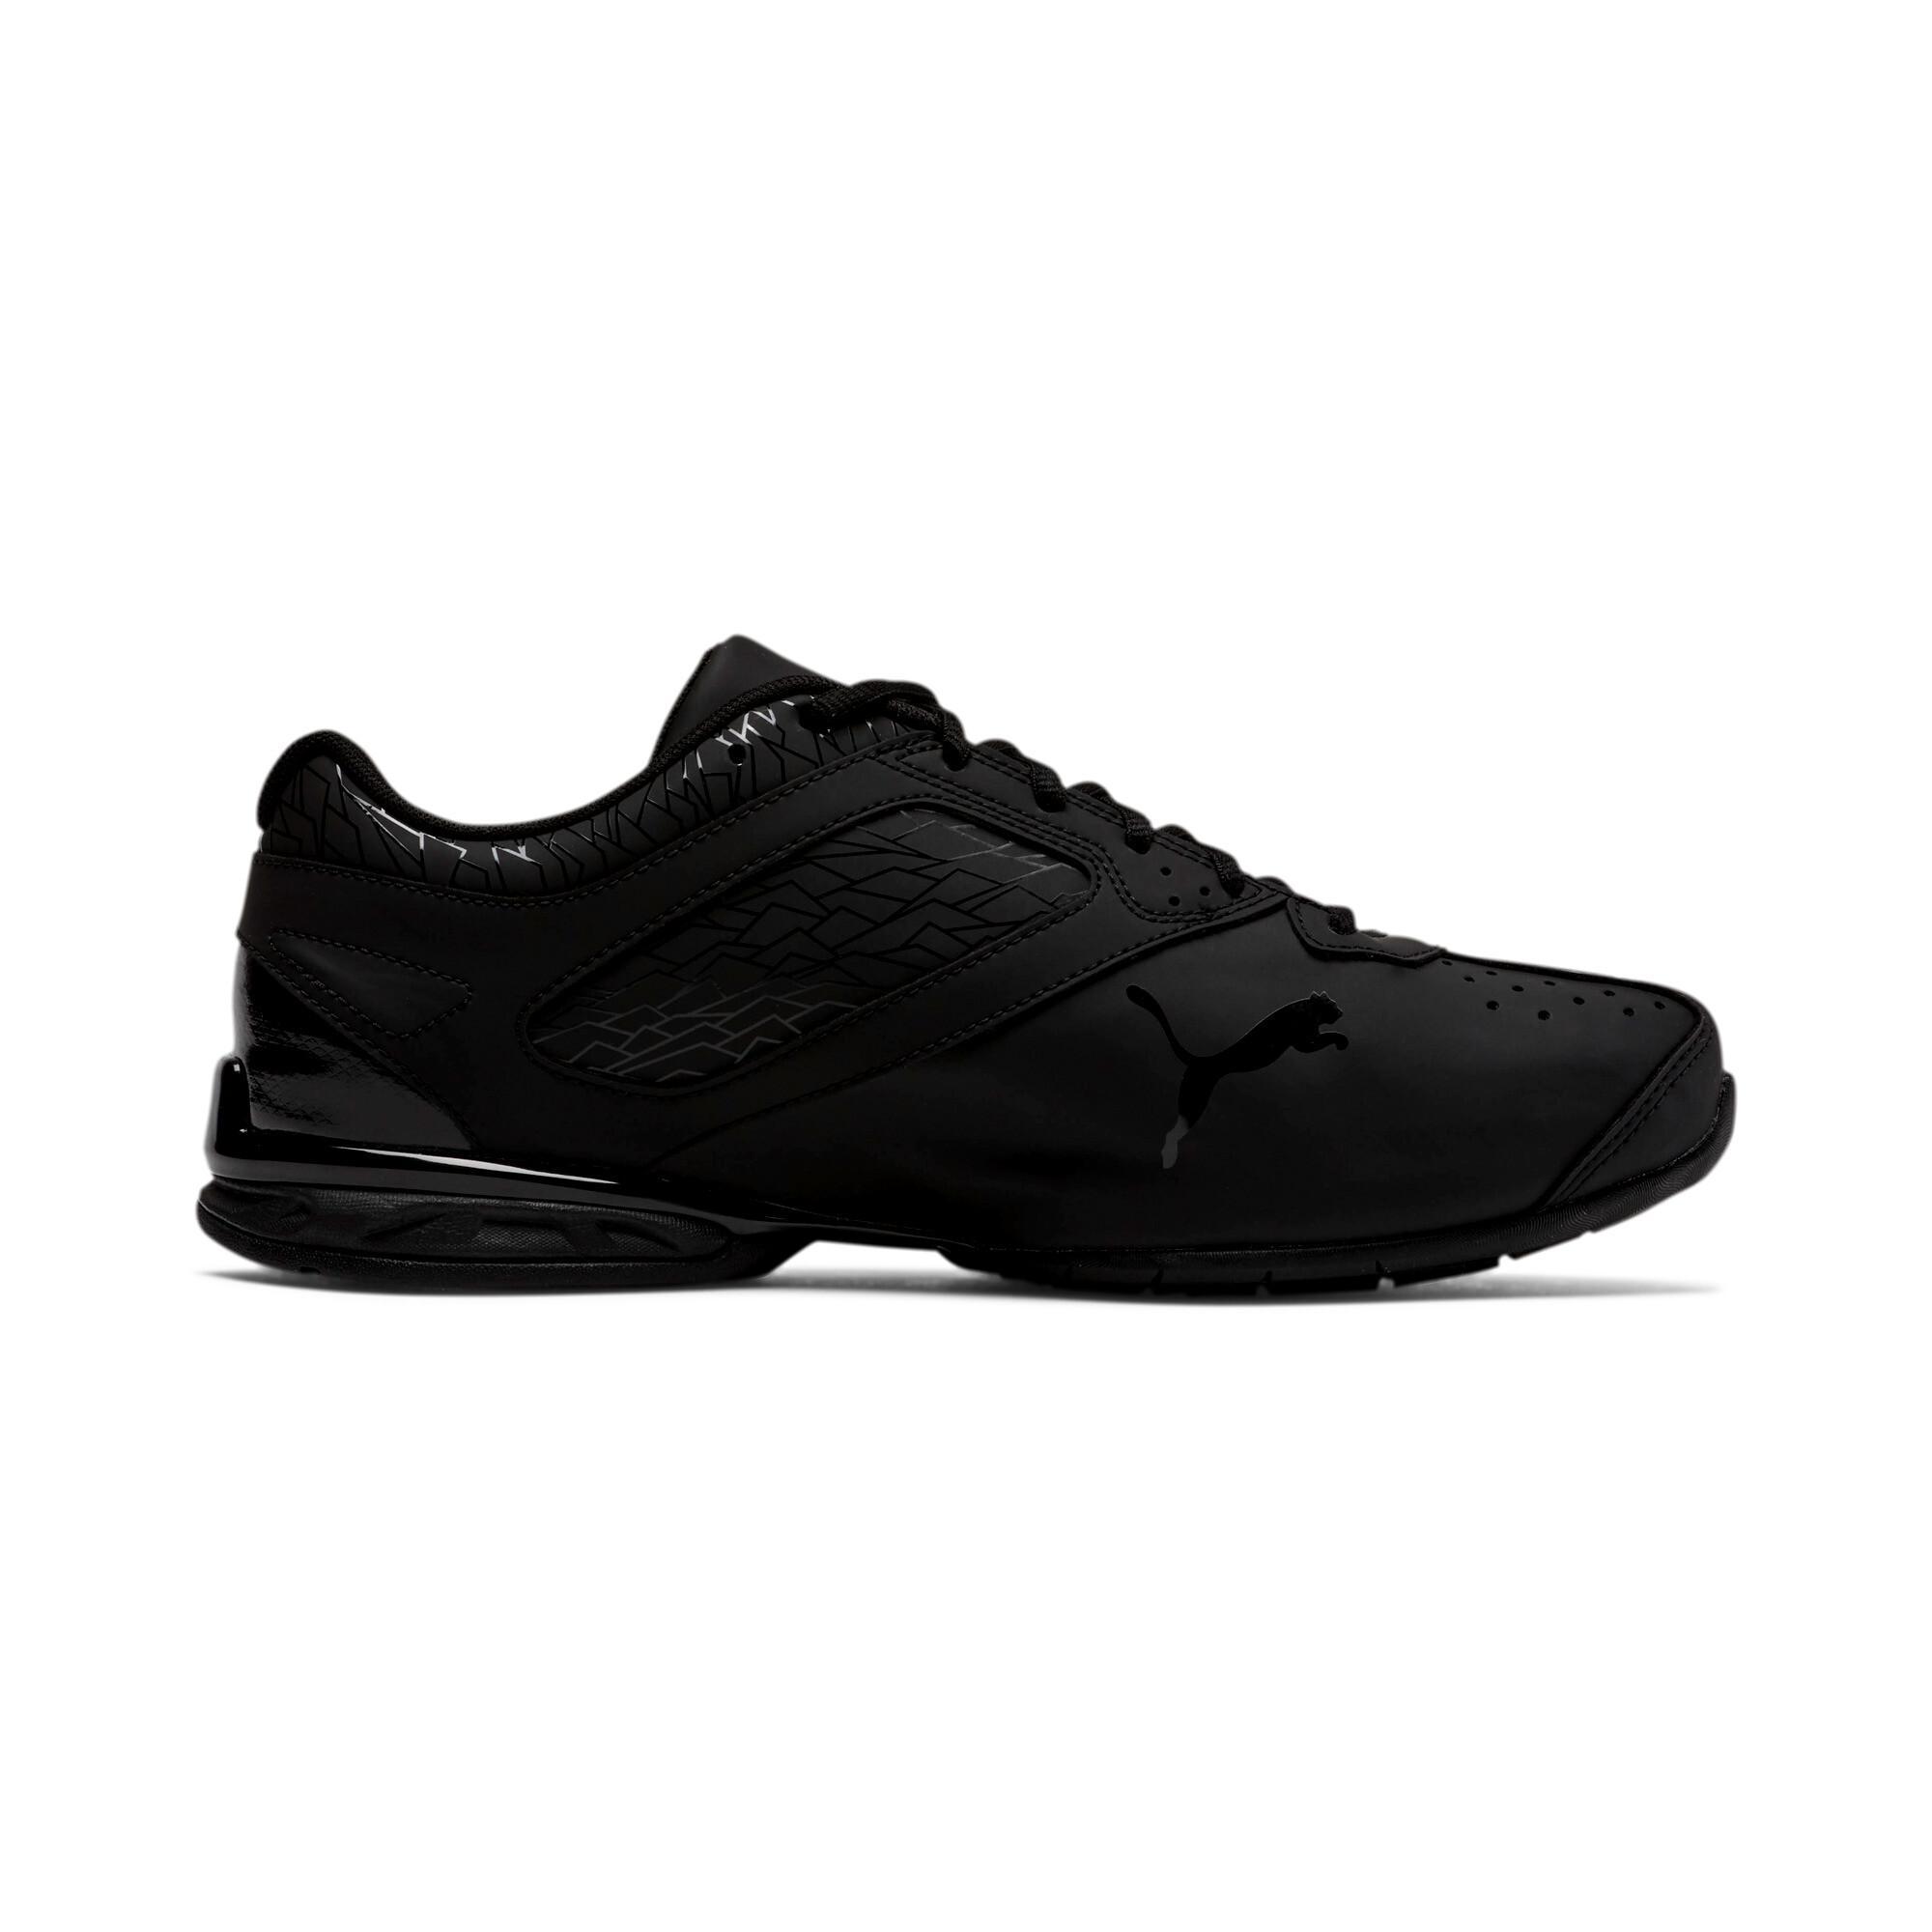 PUMA-Men-039-s-Tazon-6-Fracture-FM-Wide-Sneakers miniatura 11